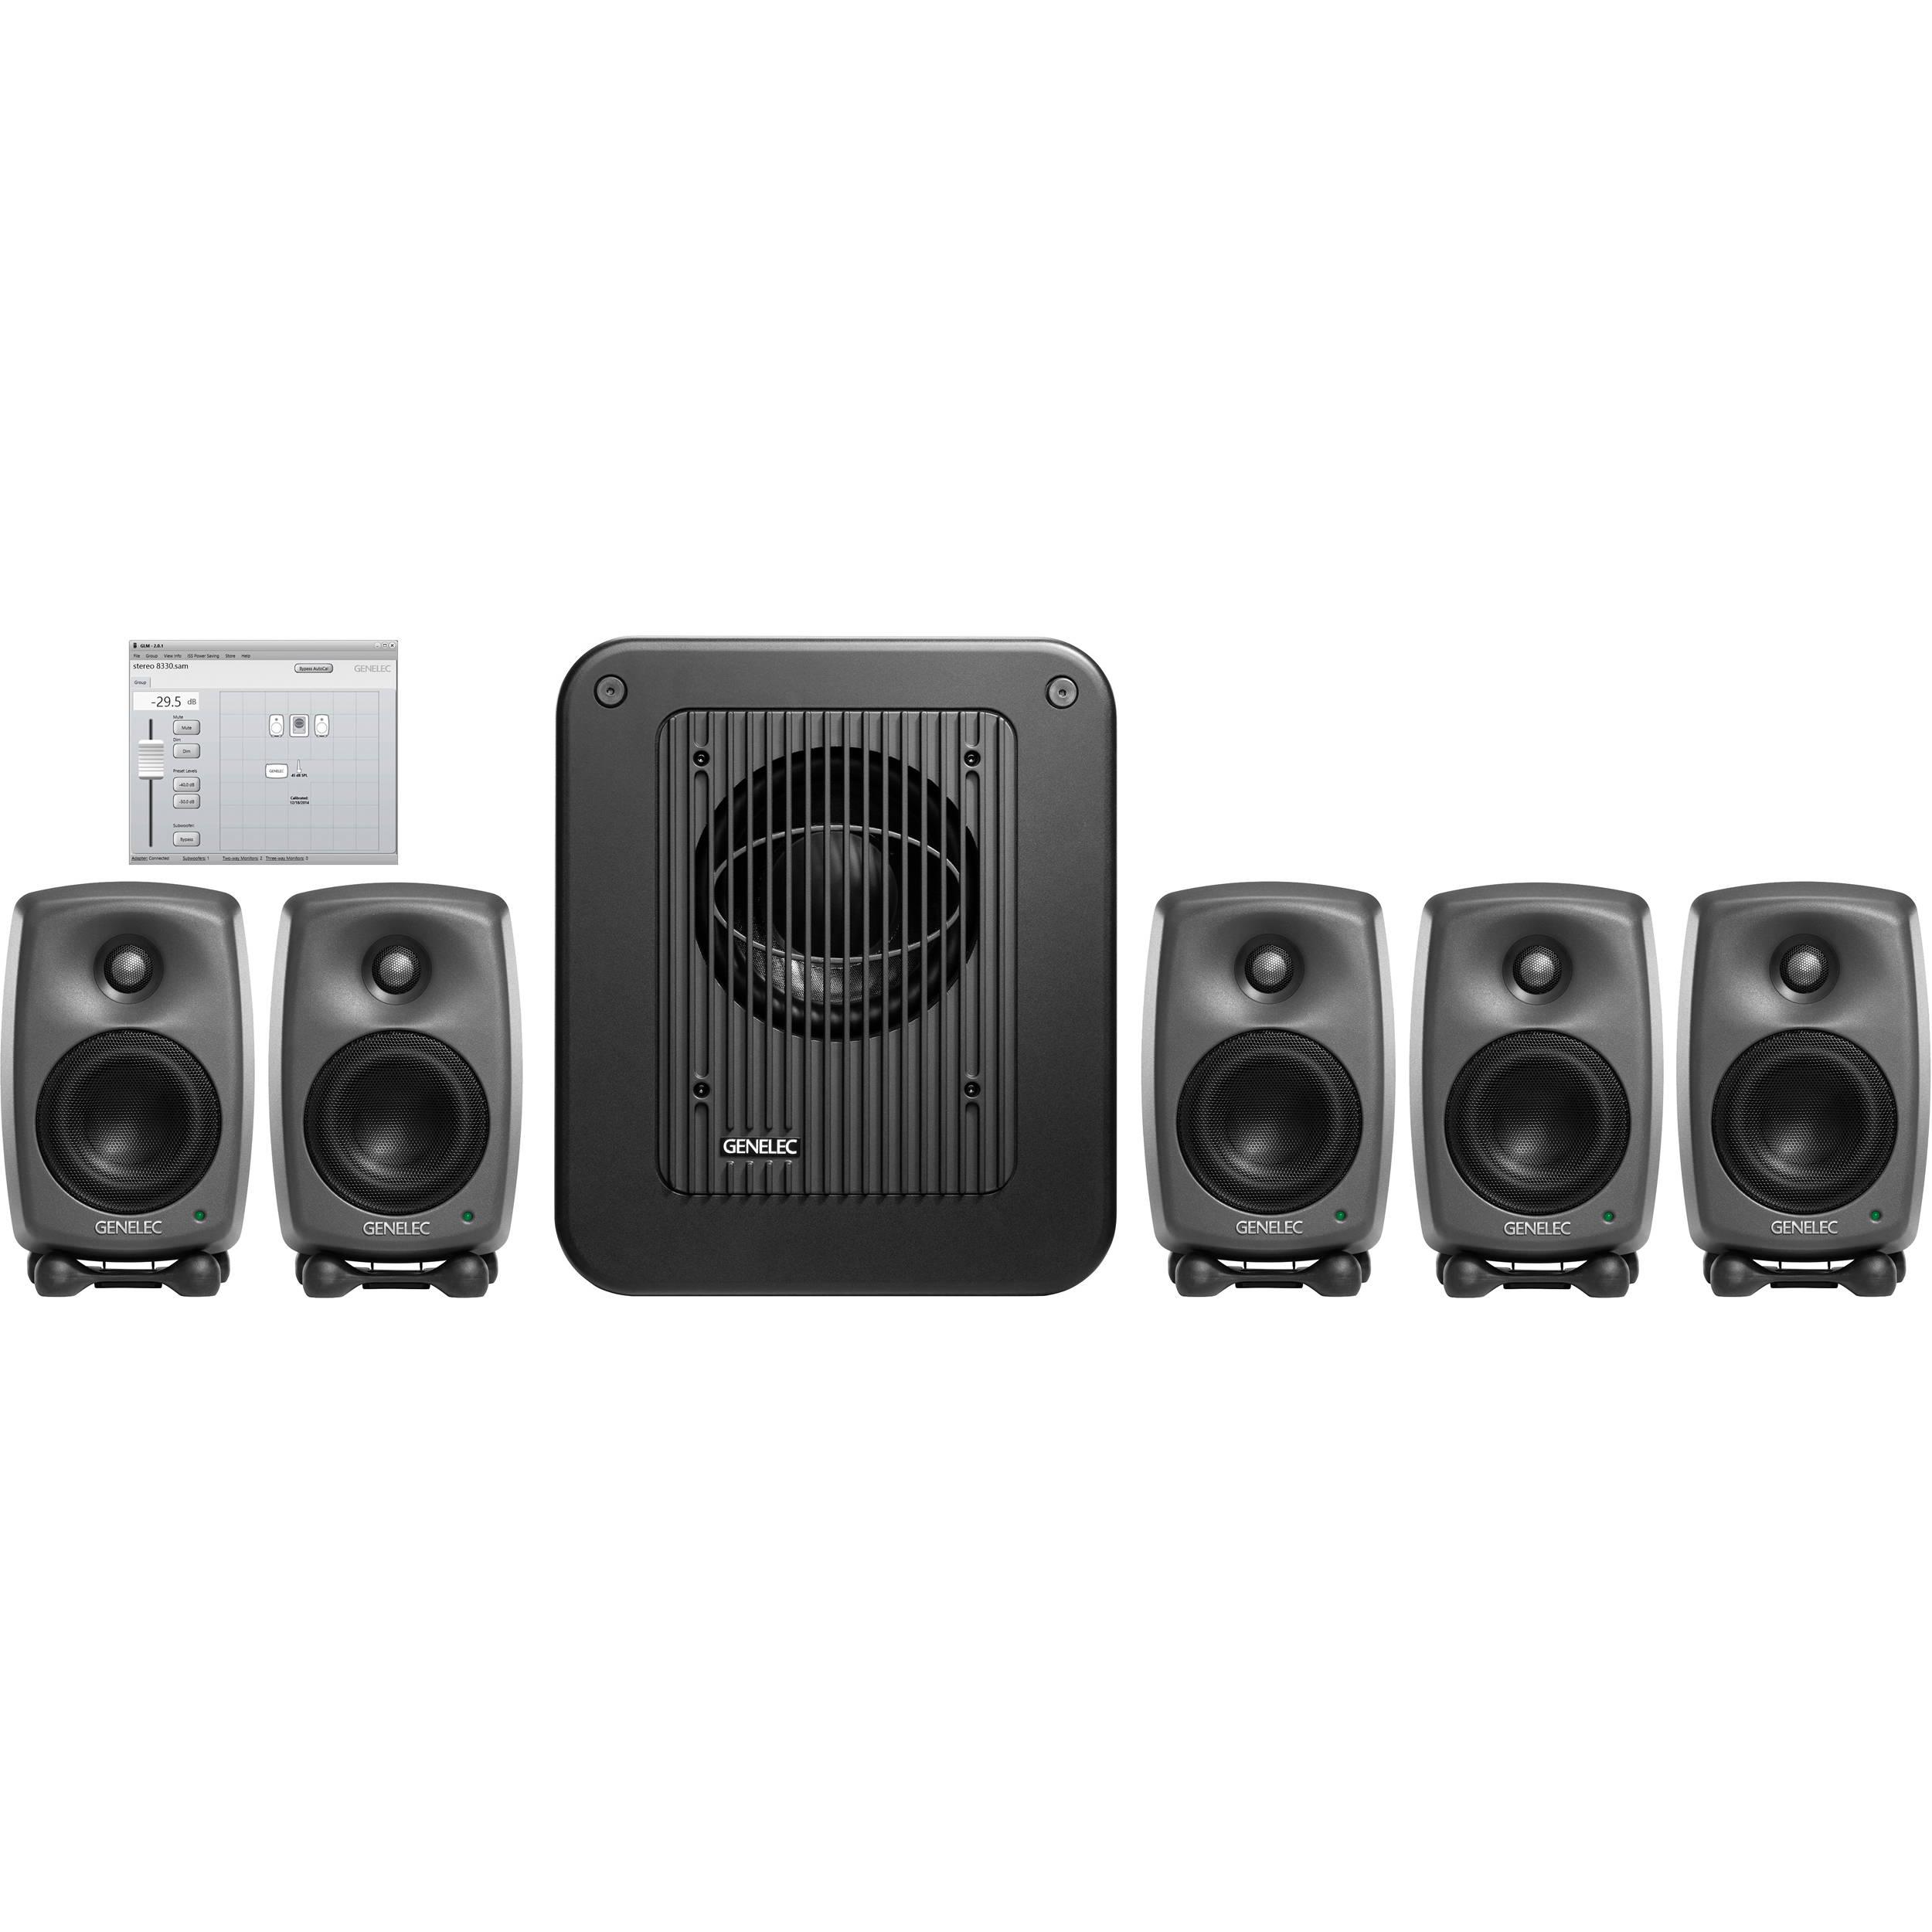 Genelec 8330.LSE Surround SAM 8330 LSE 8330A smart active monitoring monitors speakers loudspeakers